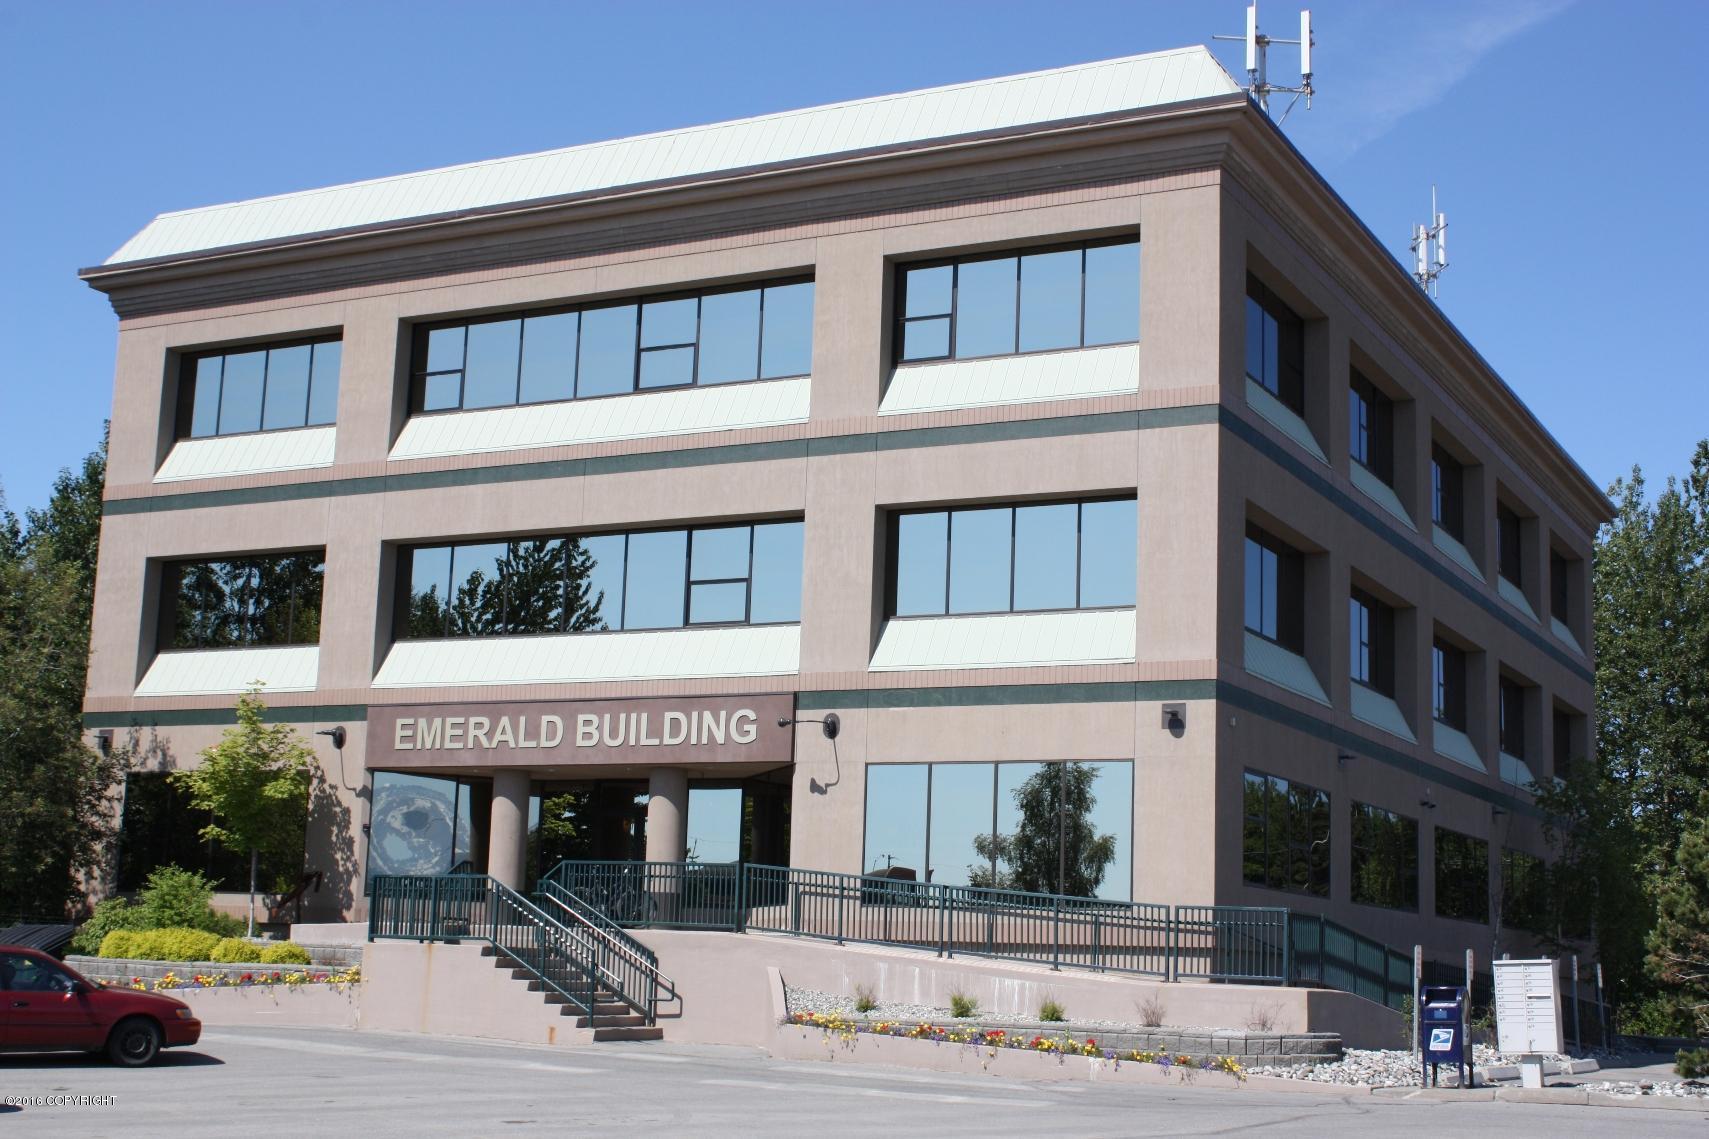 615 E 82nd Avenue, Anchorage, AK 99518 - Andrew Ingram